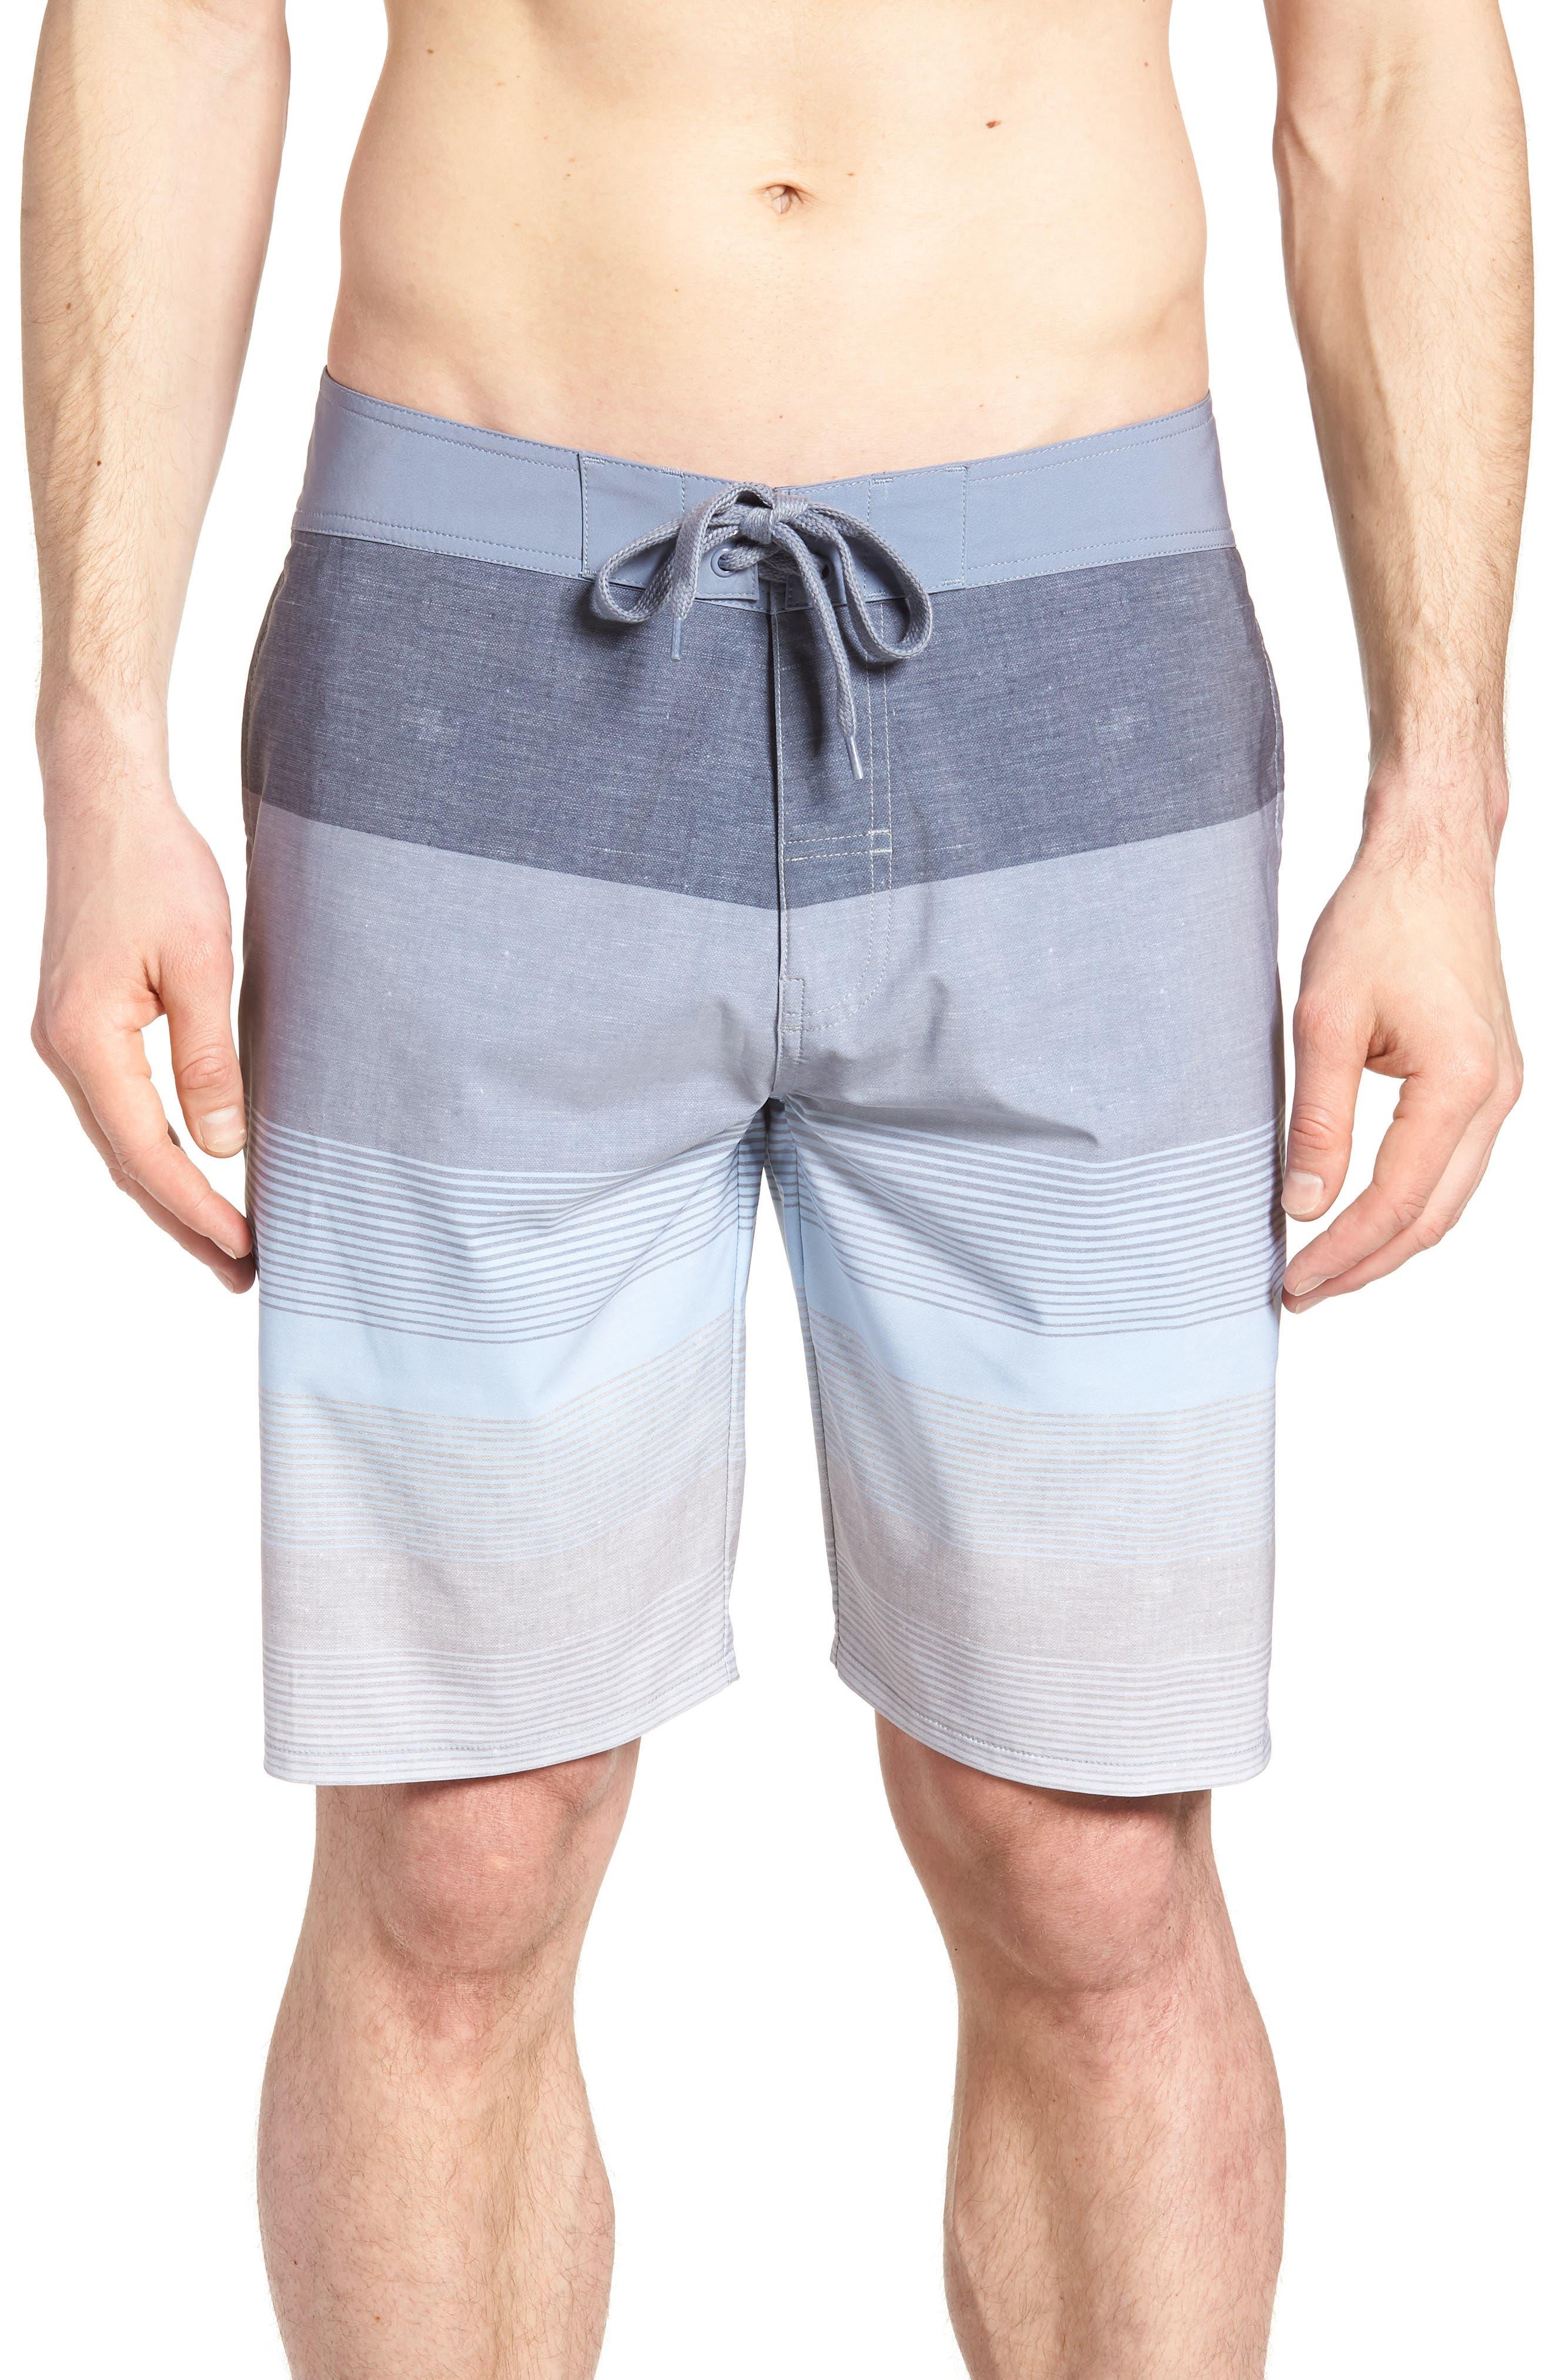 Seegrid Regular Fit Board Shorts,                         Main,                         color, 401